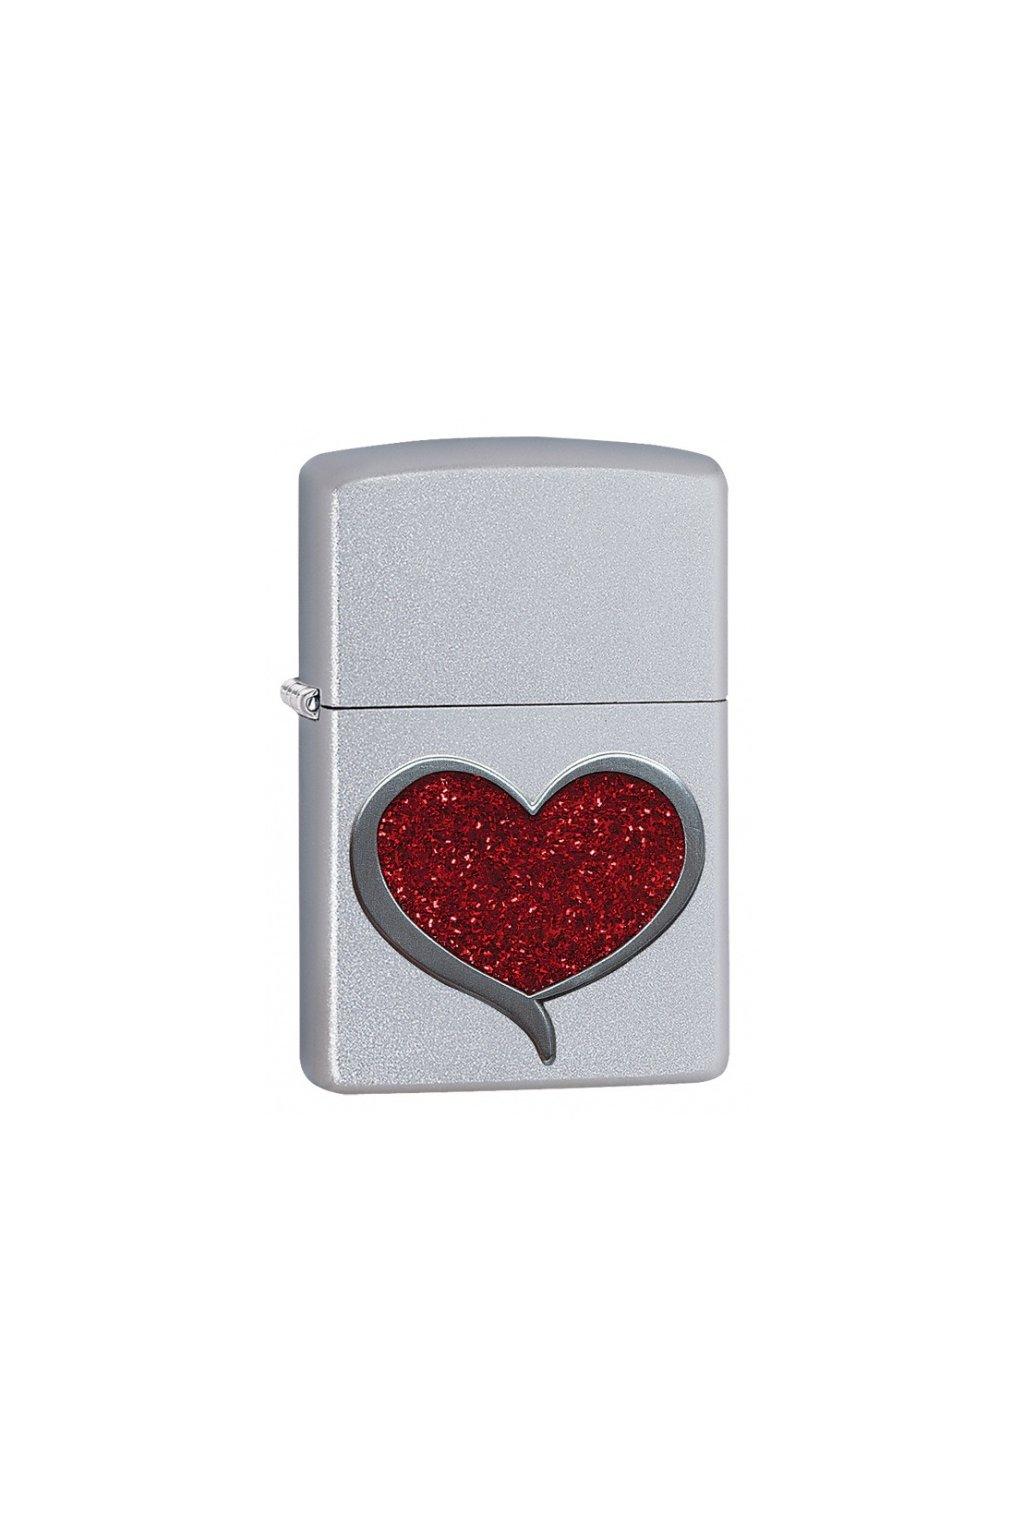 92750 zippo zapalovac 20042 glitter heart